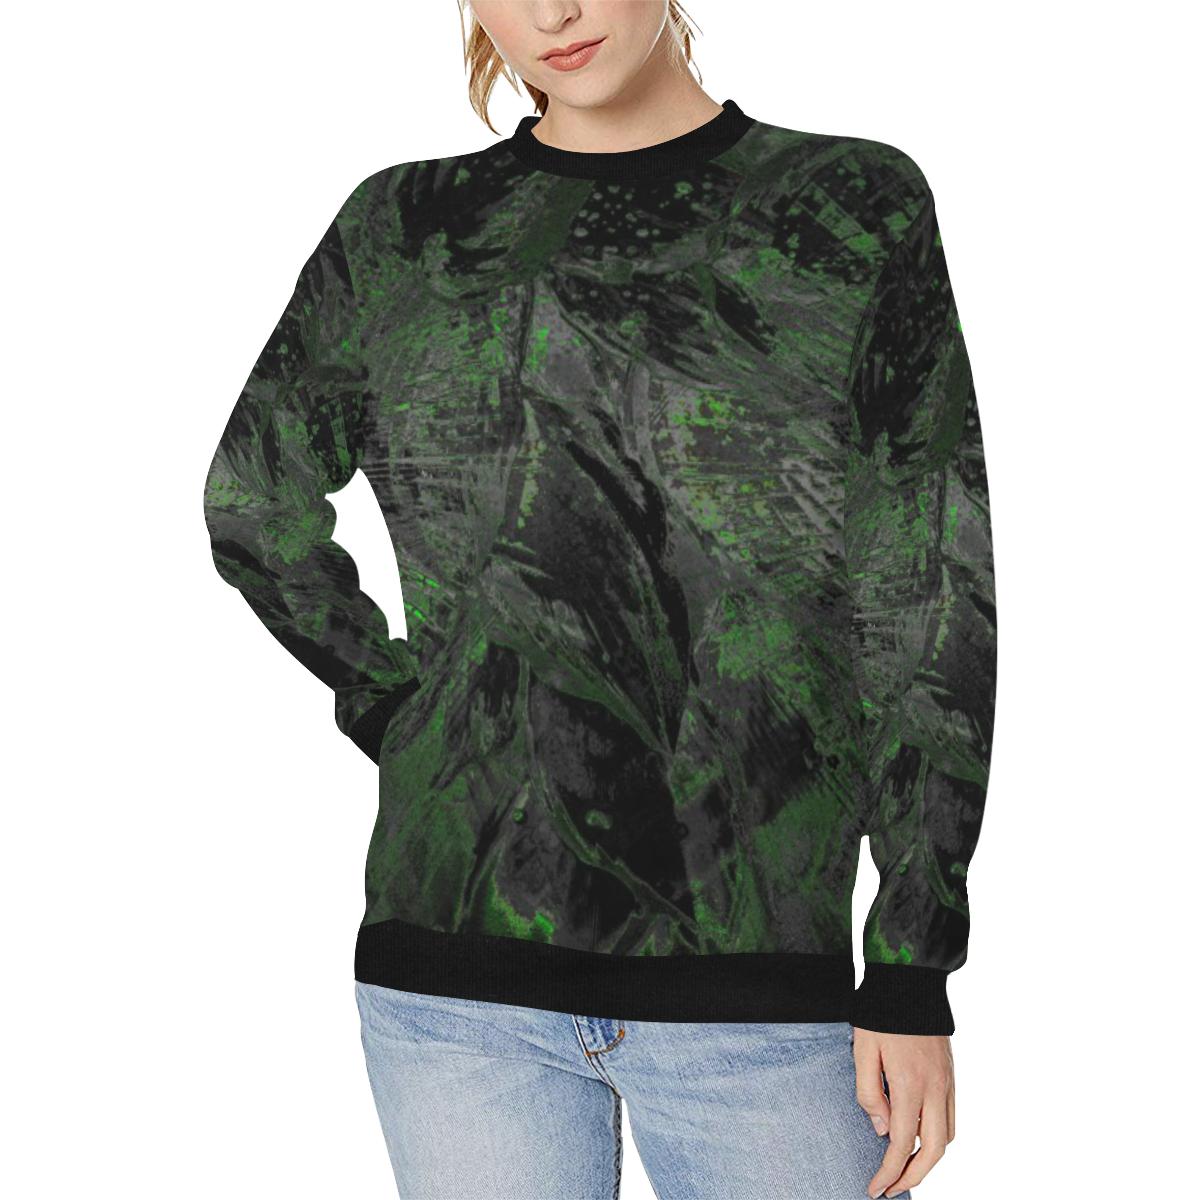 wheelVibe_8500 45 SOLDIER NIGHT low Women's Rib Cuff Crew Neck Sweatshirt (Model H34)